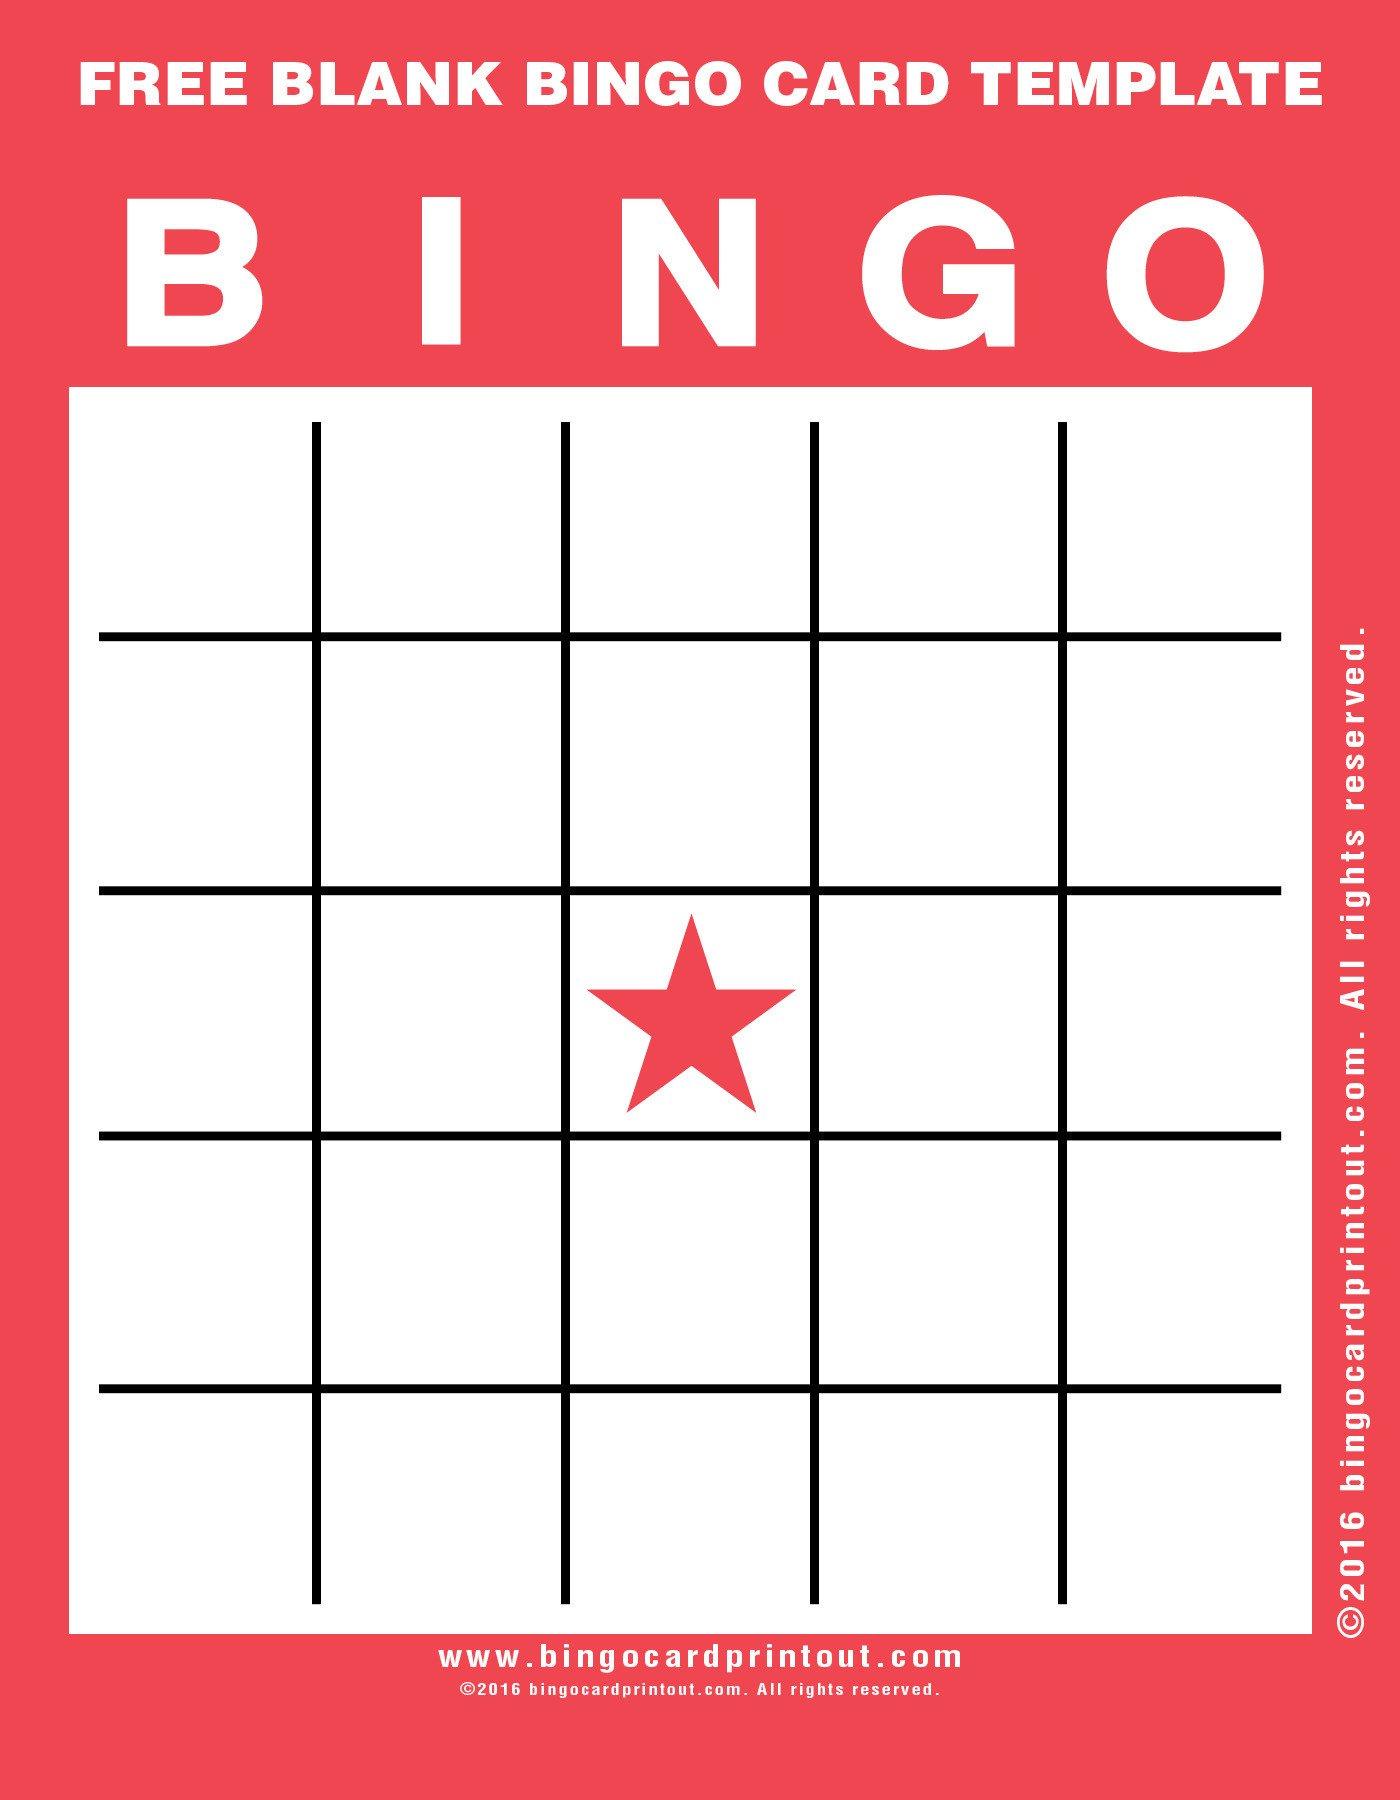 Blank Bingo Card Template Free Blank Bingo Card Template Bingocardprintout